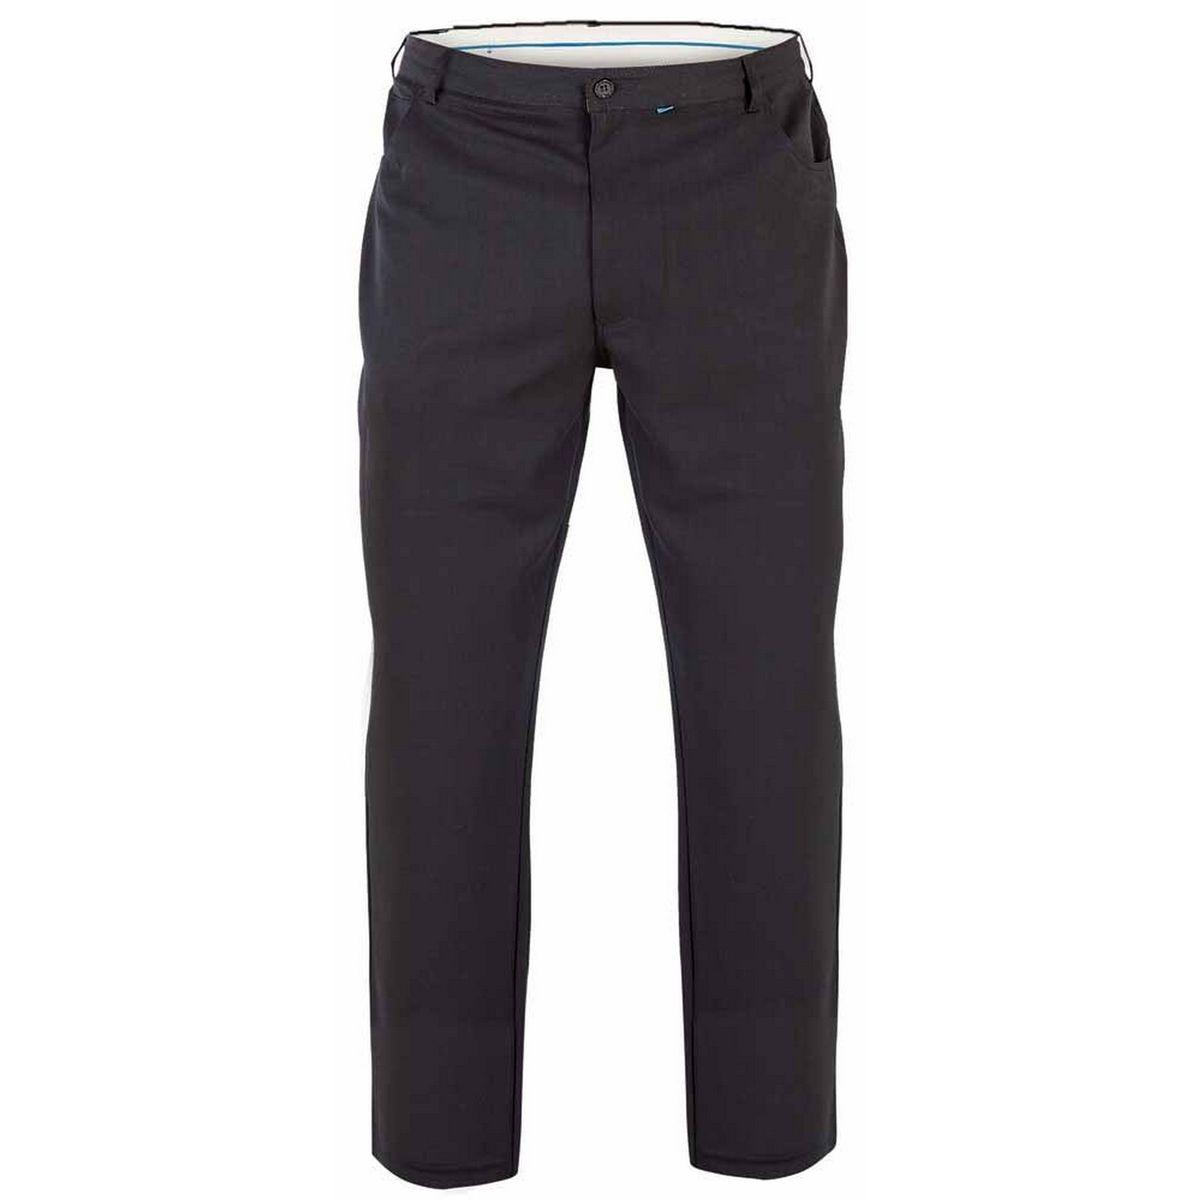 Pantalon LONDON BECK D555